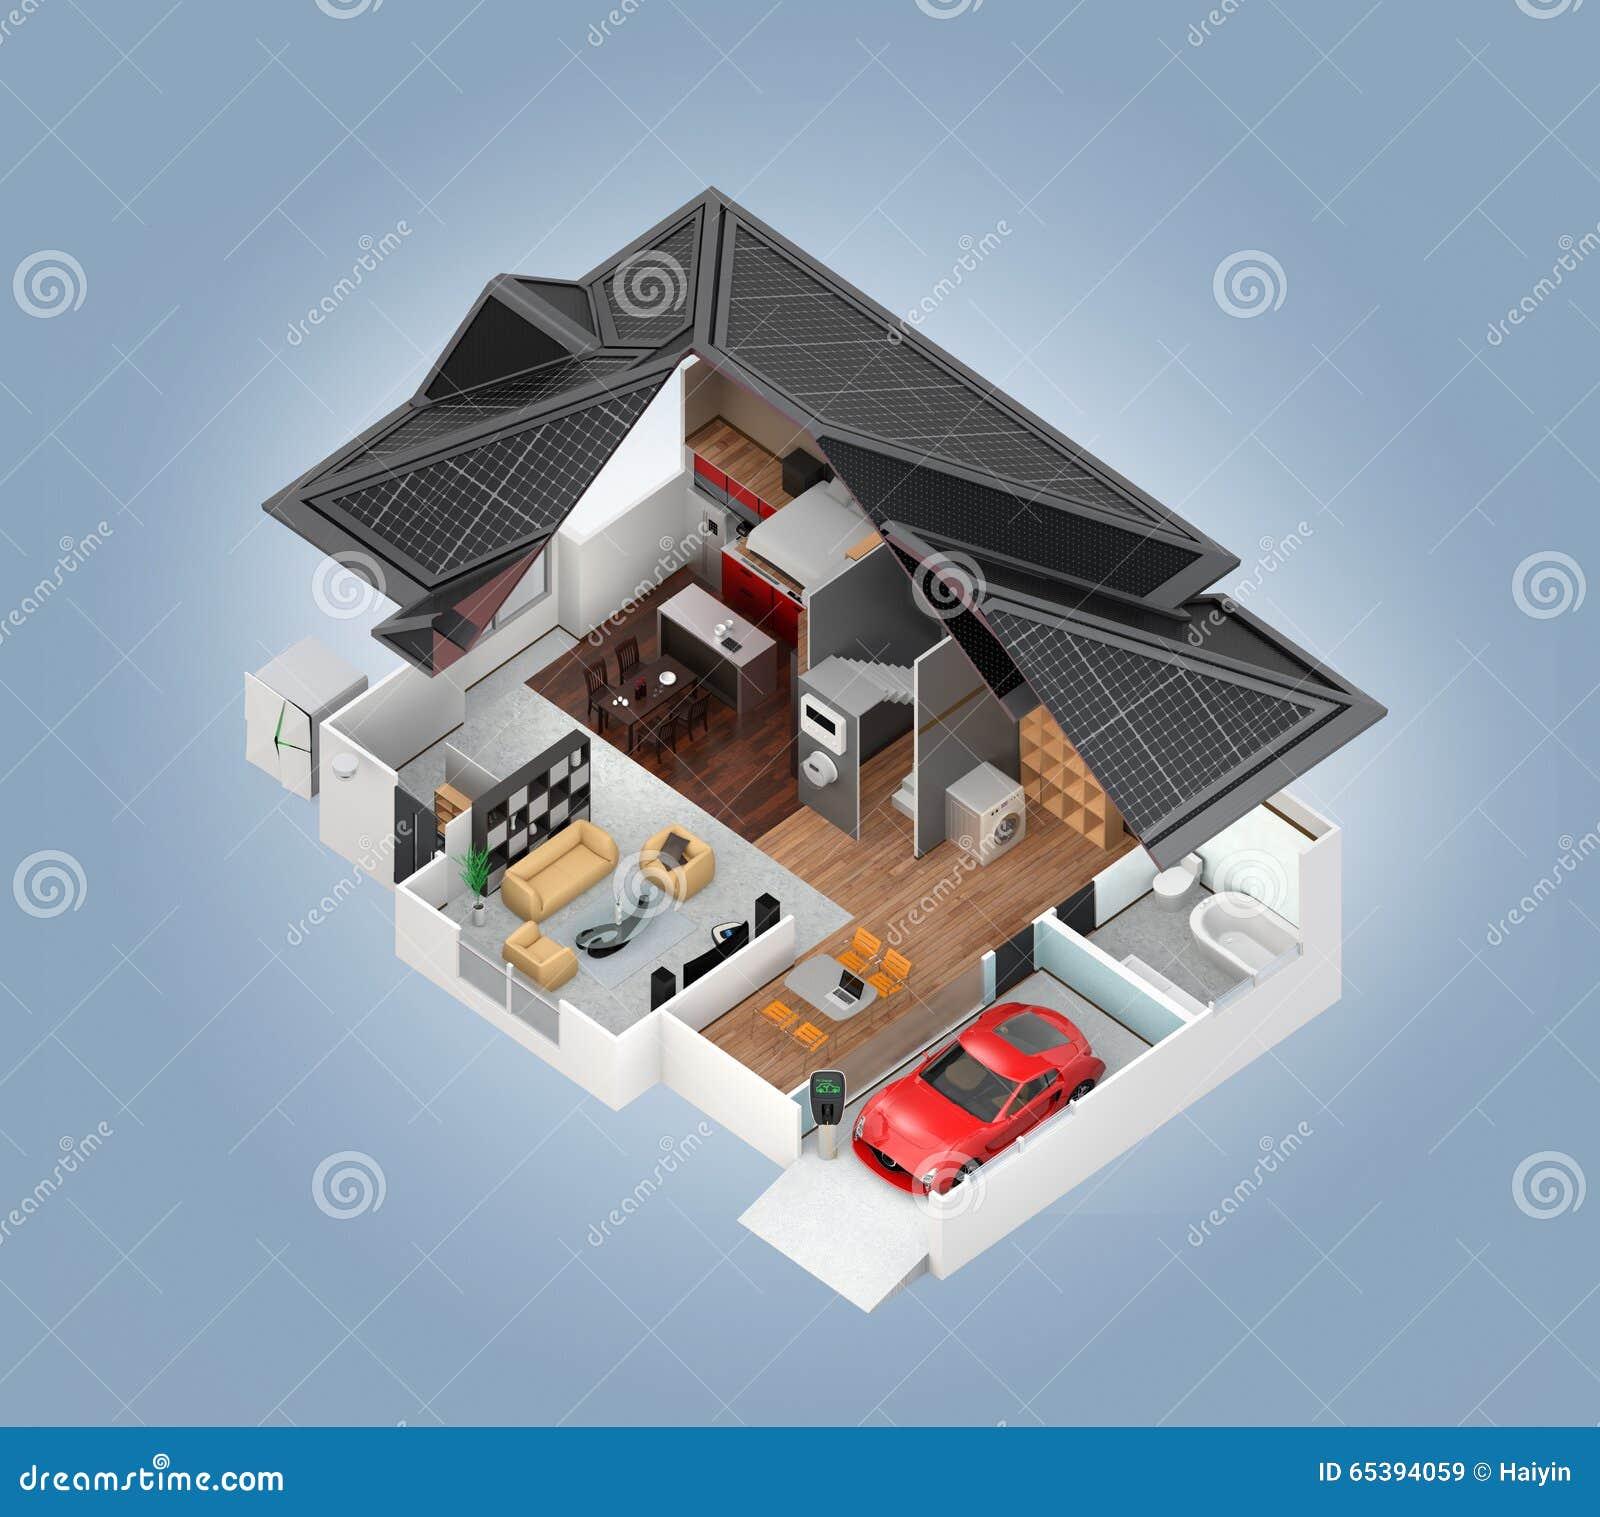 Ideia cortante do interior esperto da casa